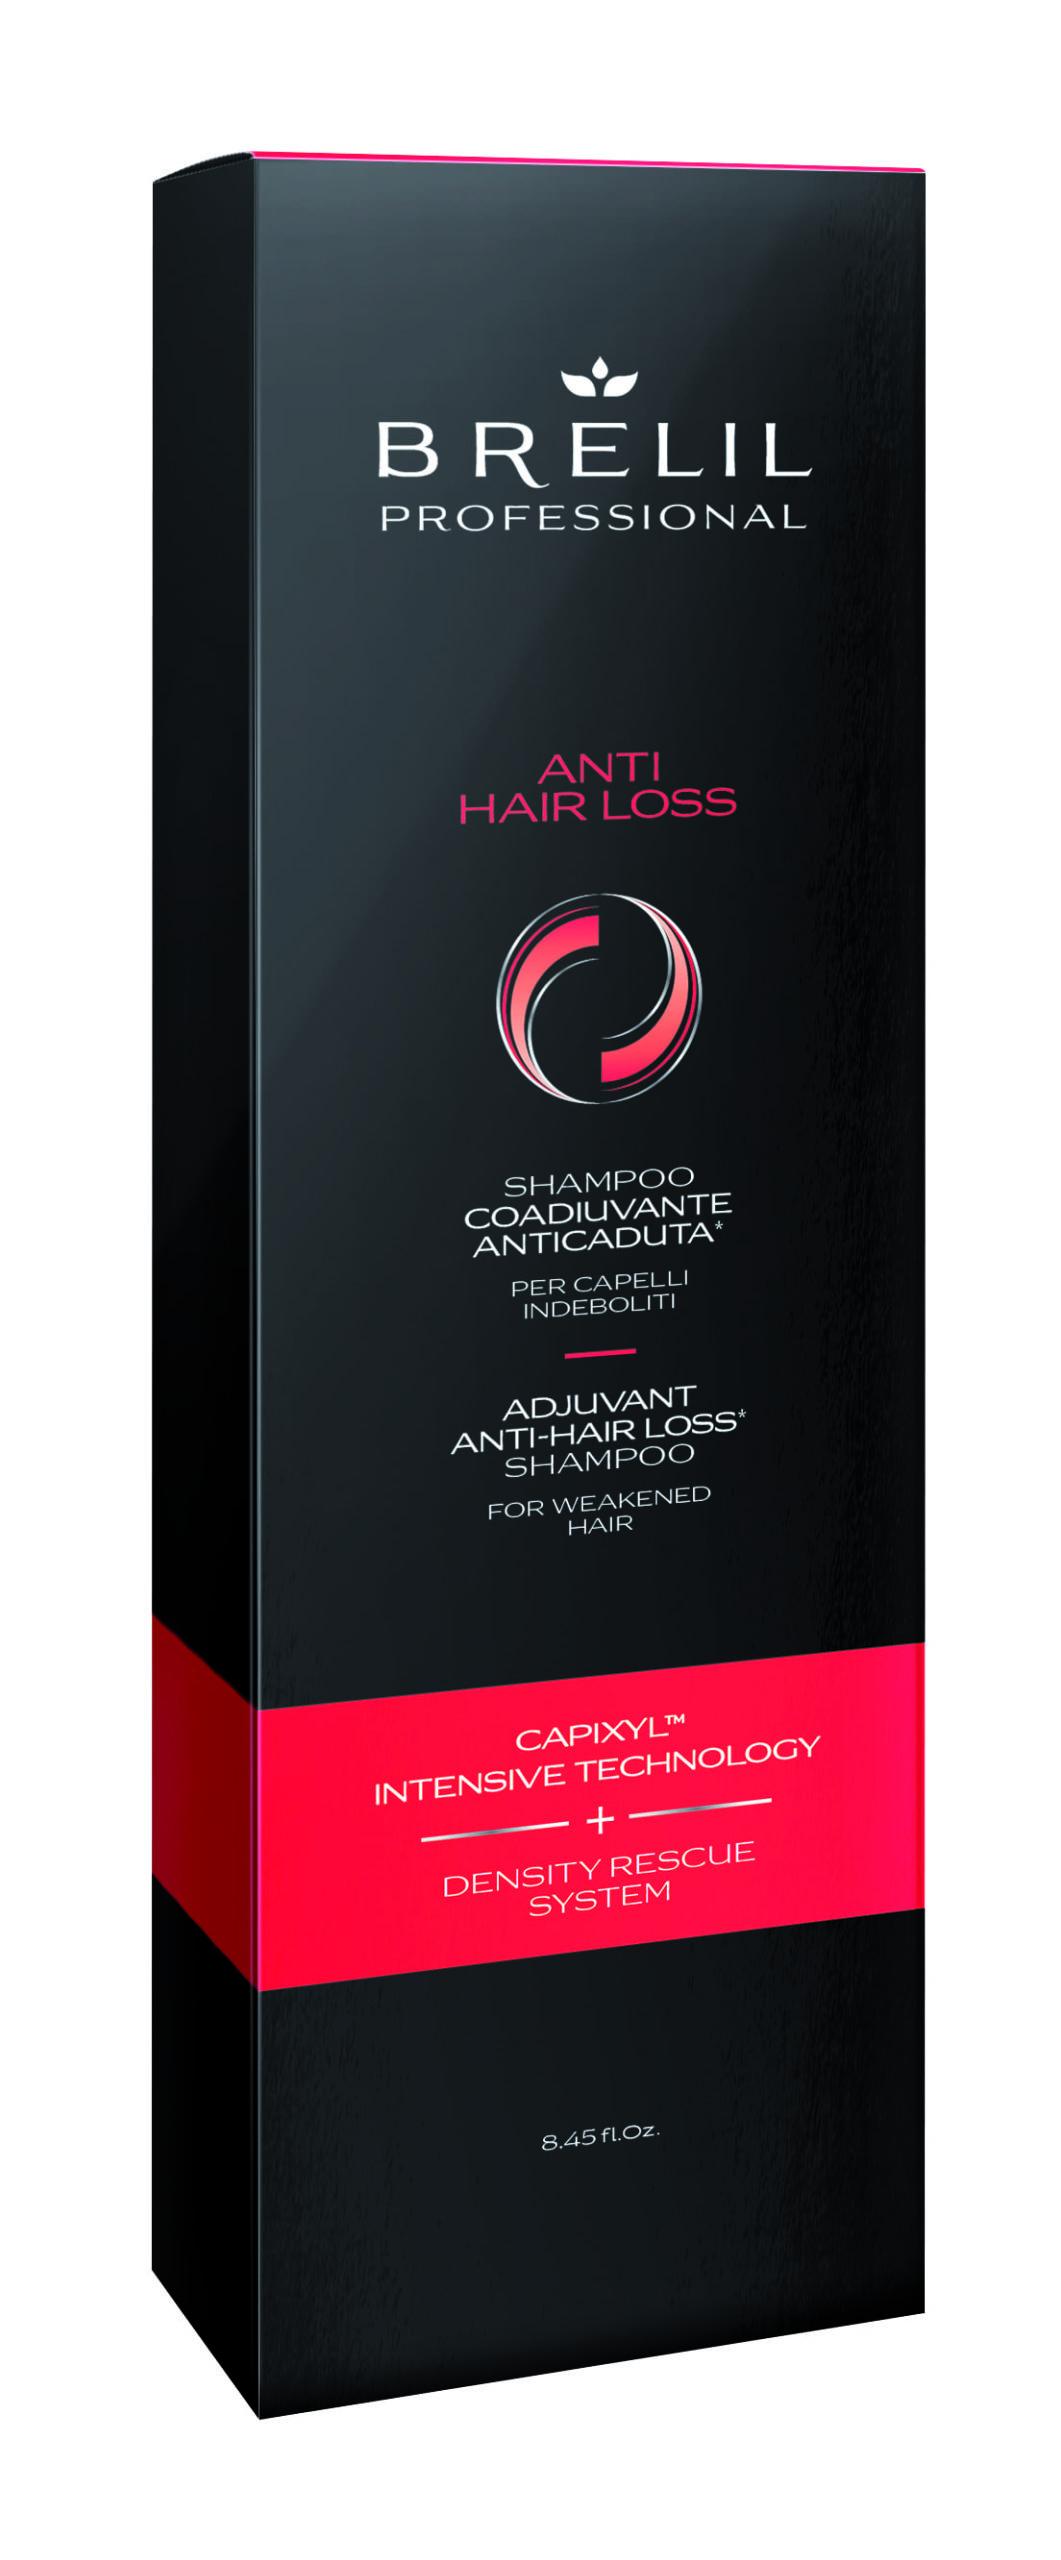 BrelilAntihairloss shampoo250 scaled 1 - Краска для волос Колорианн Престиж, 100 мл